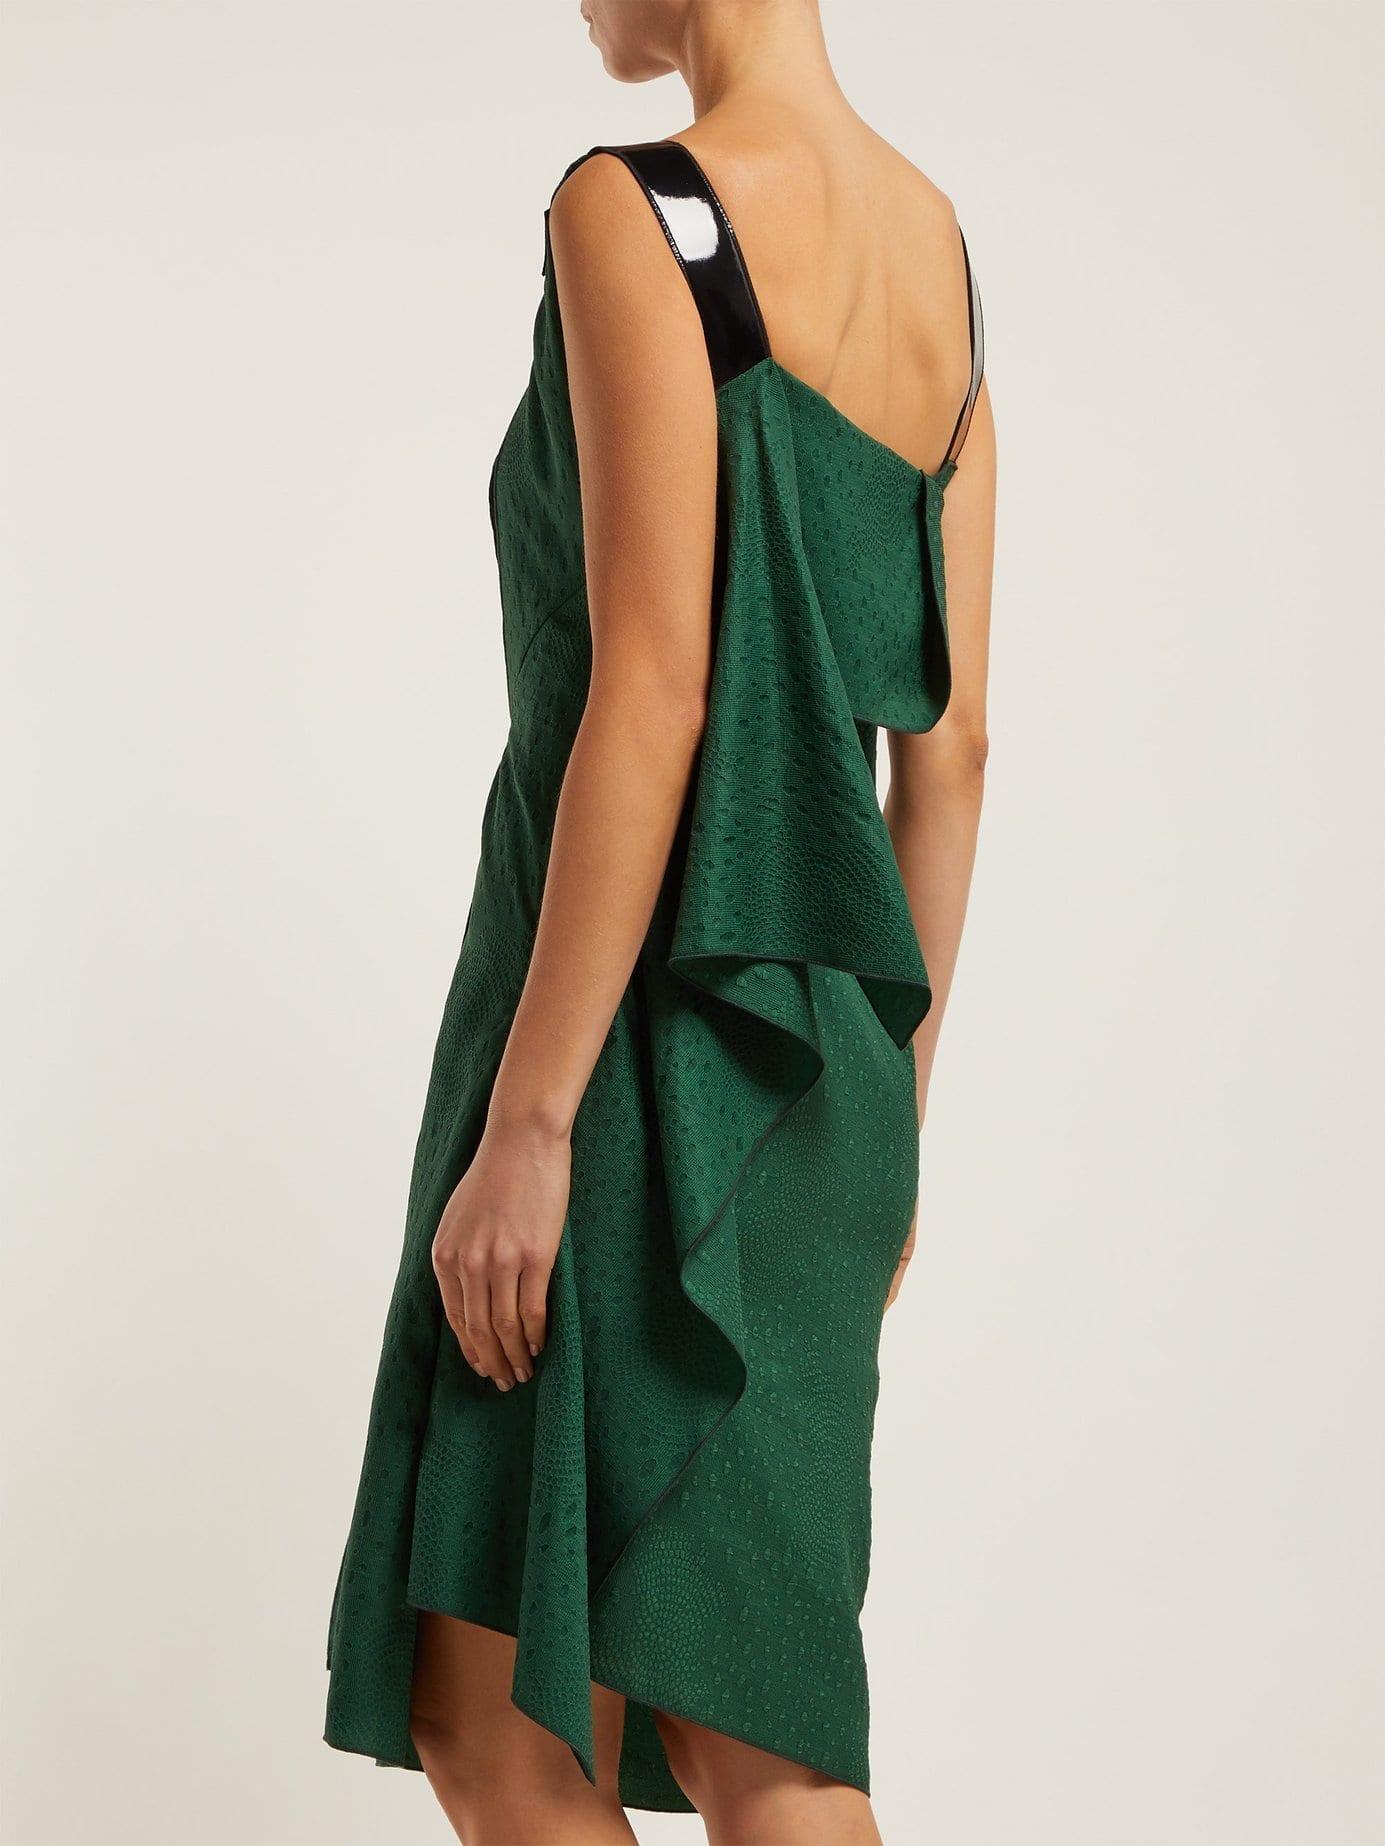 Roland Mouret Cedrela Silk Blend Jacquard Asymmetric Midi Green Dress 4